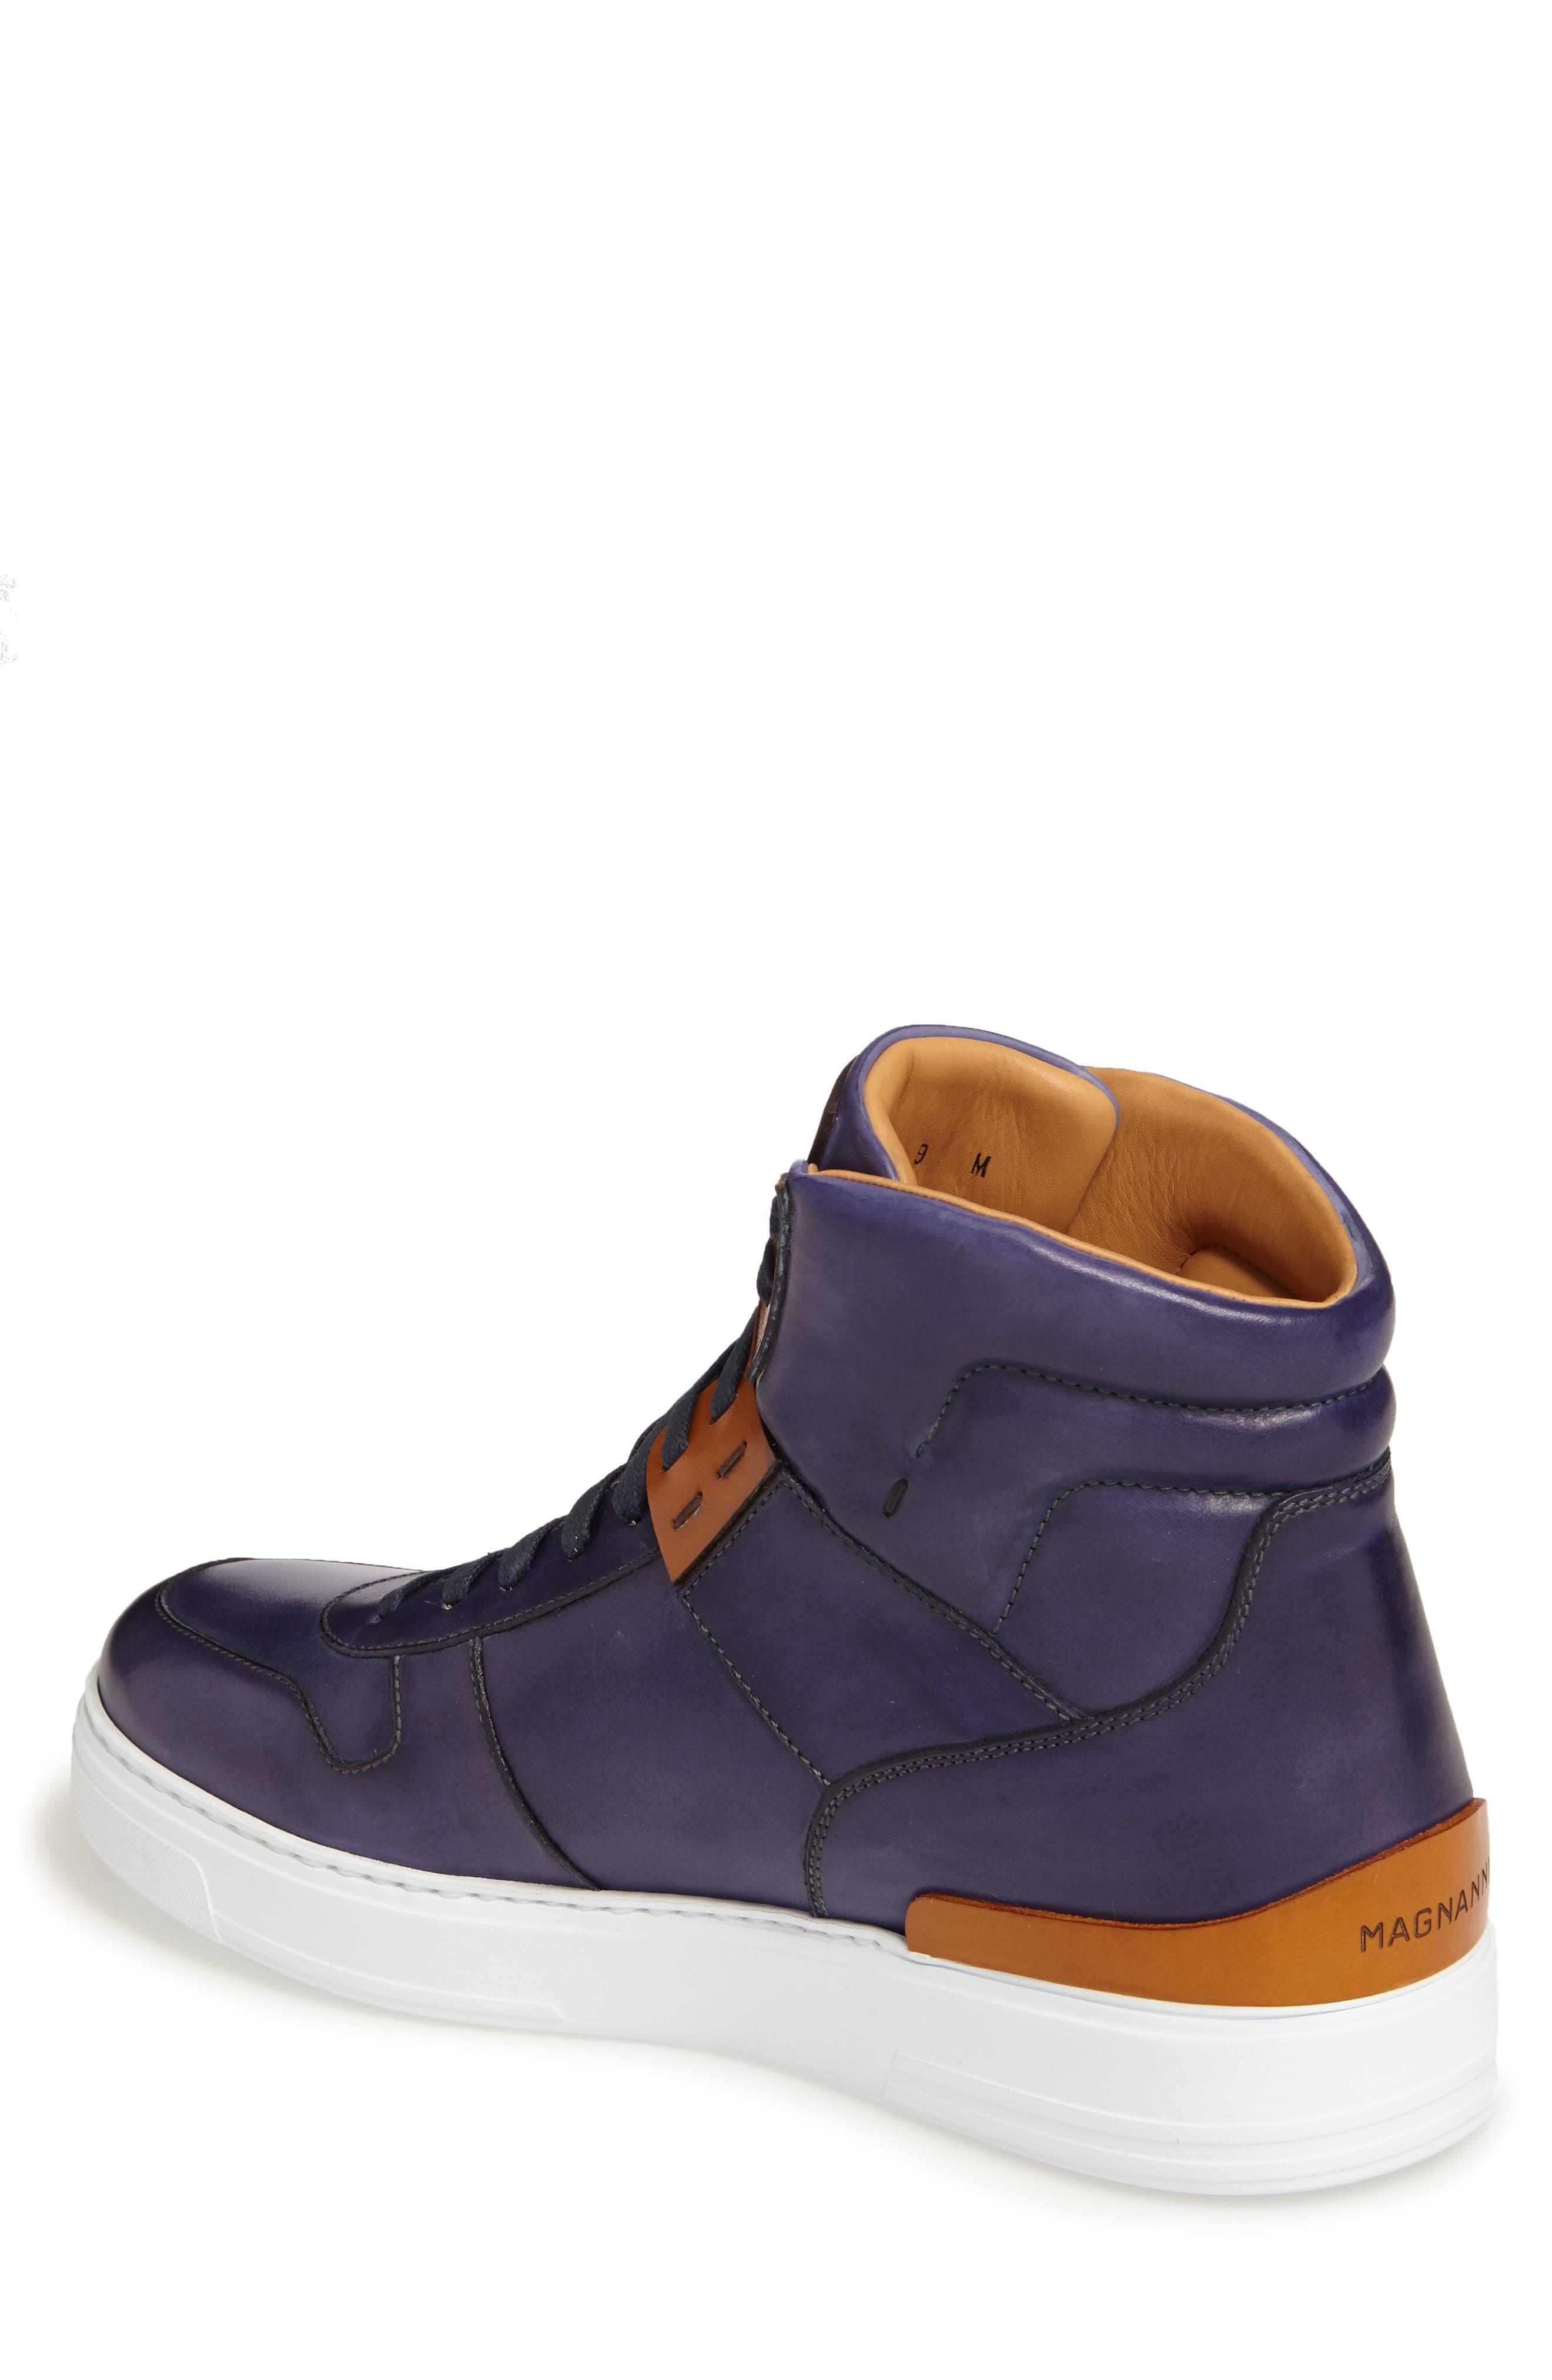 Endo Hi Sneaker,                             Alternate thumbnail 4, color,